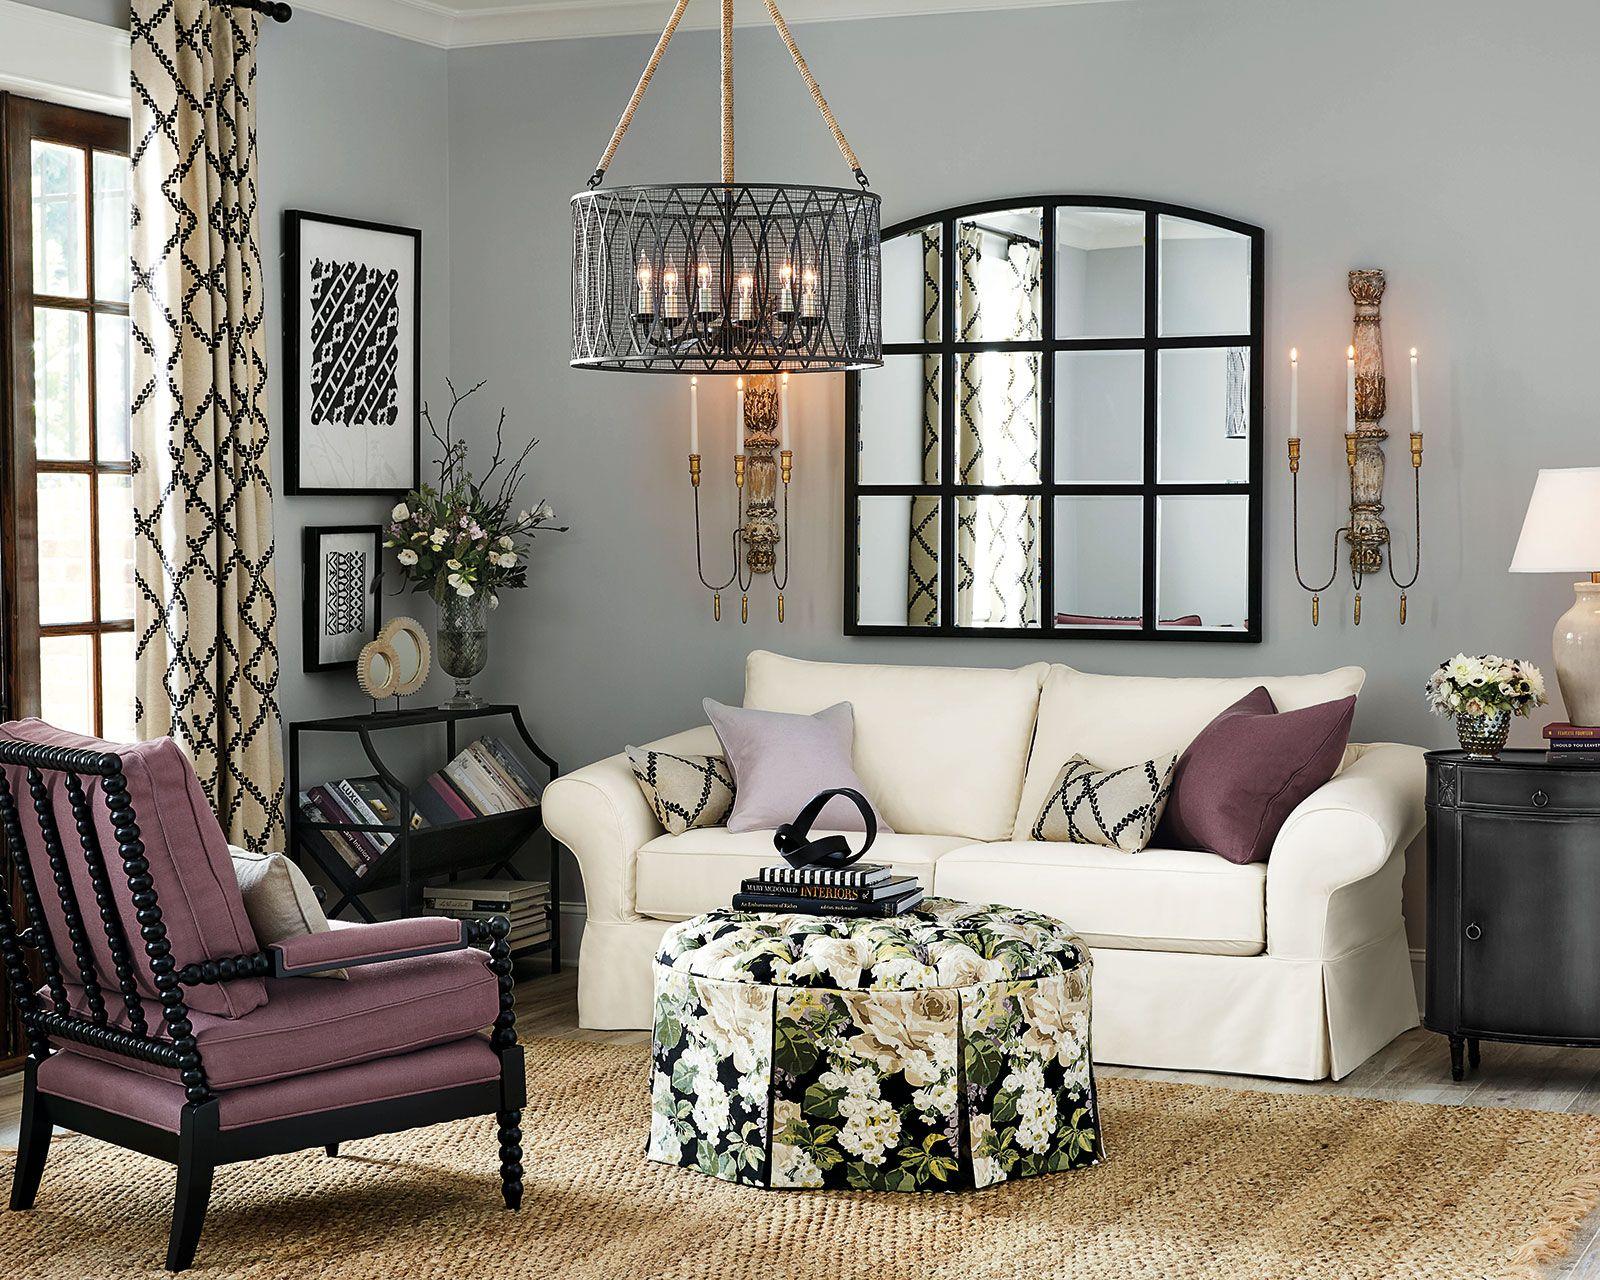 Ballard Designs Winter 2017 Collection | Living room plan ...